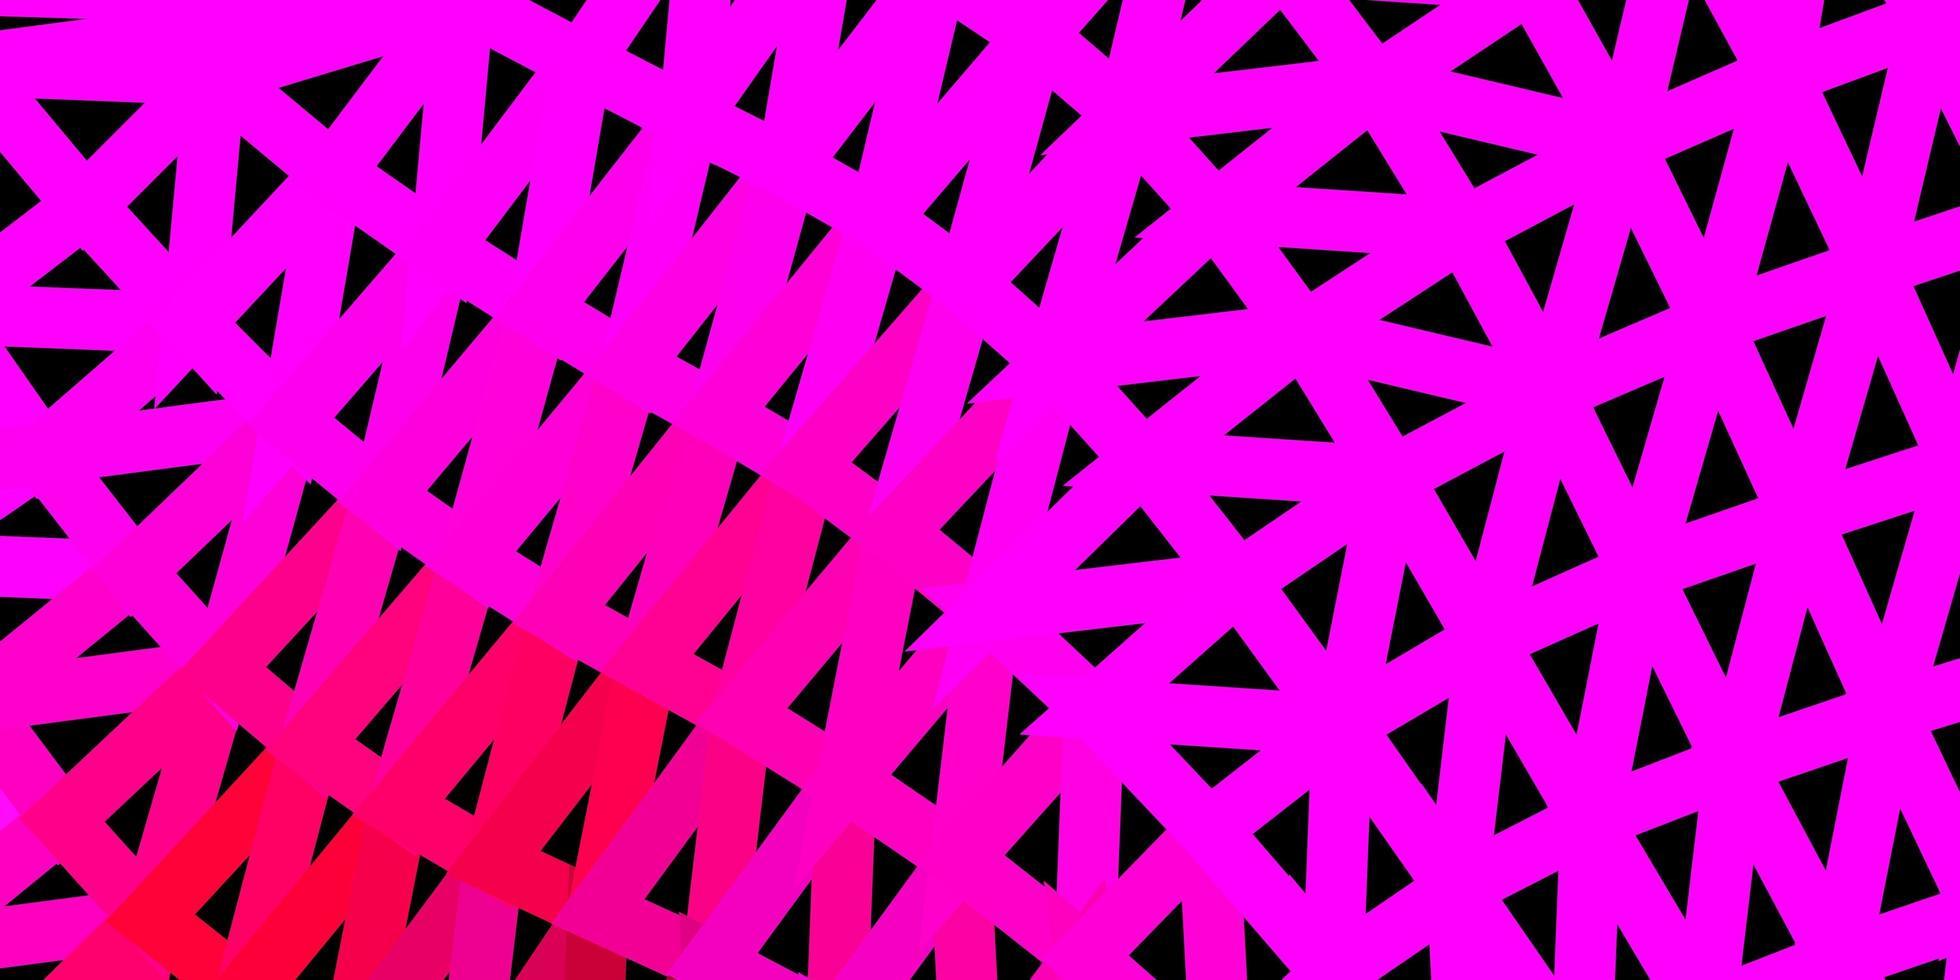 dunkler lila, rosa Vektor abstrakter Dreieck Hintergrund.